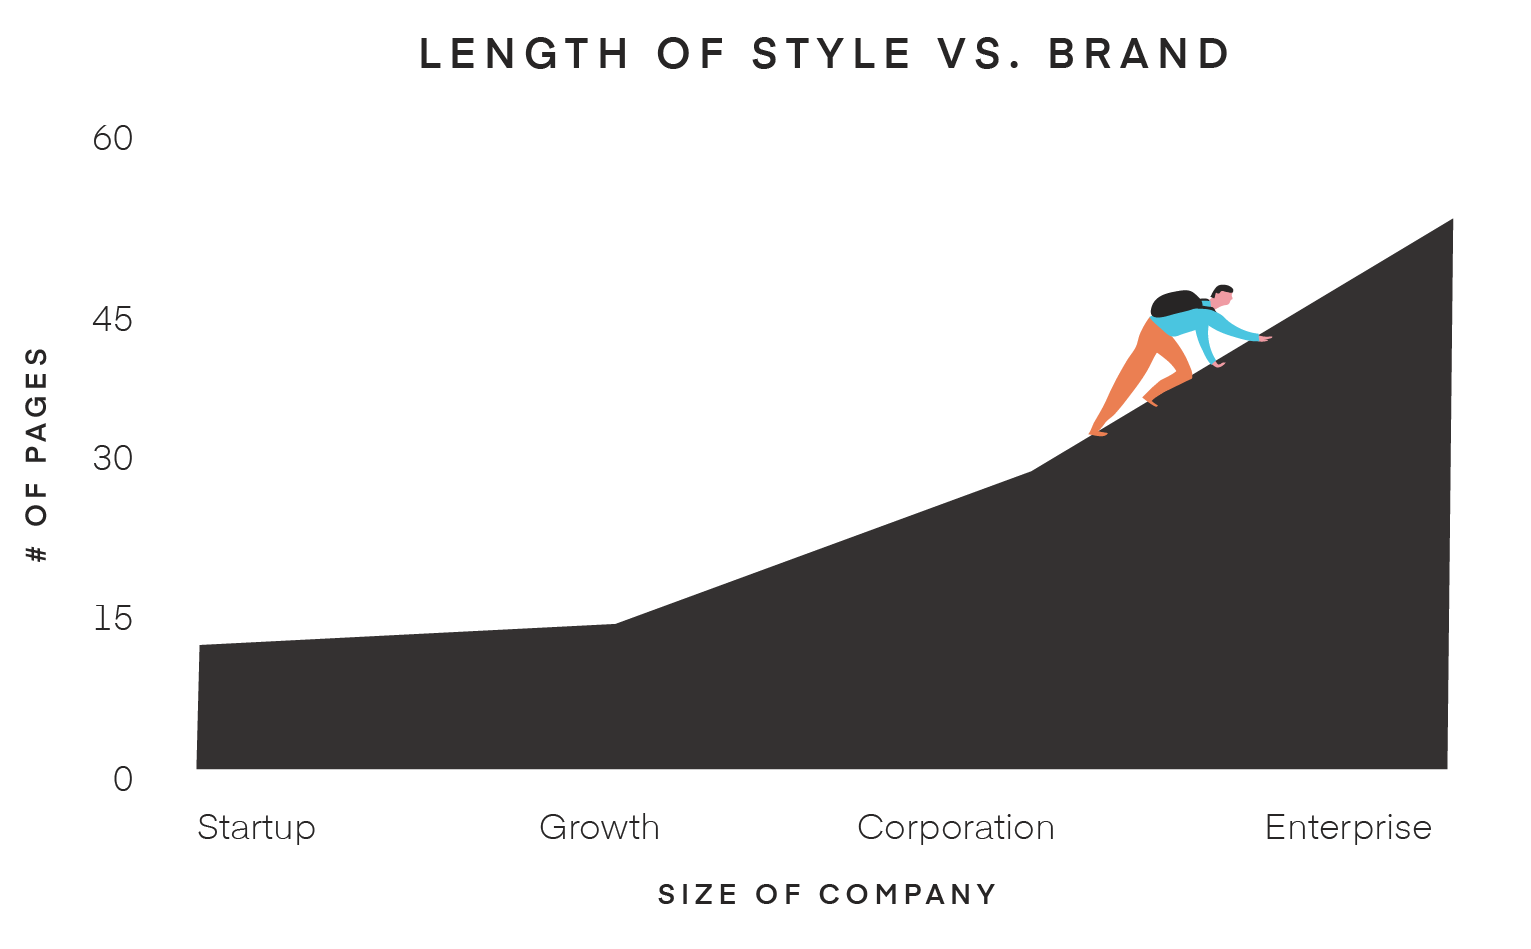 Length of style vs Brand chart